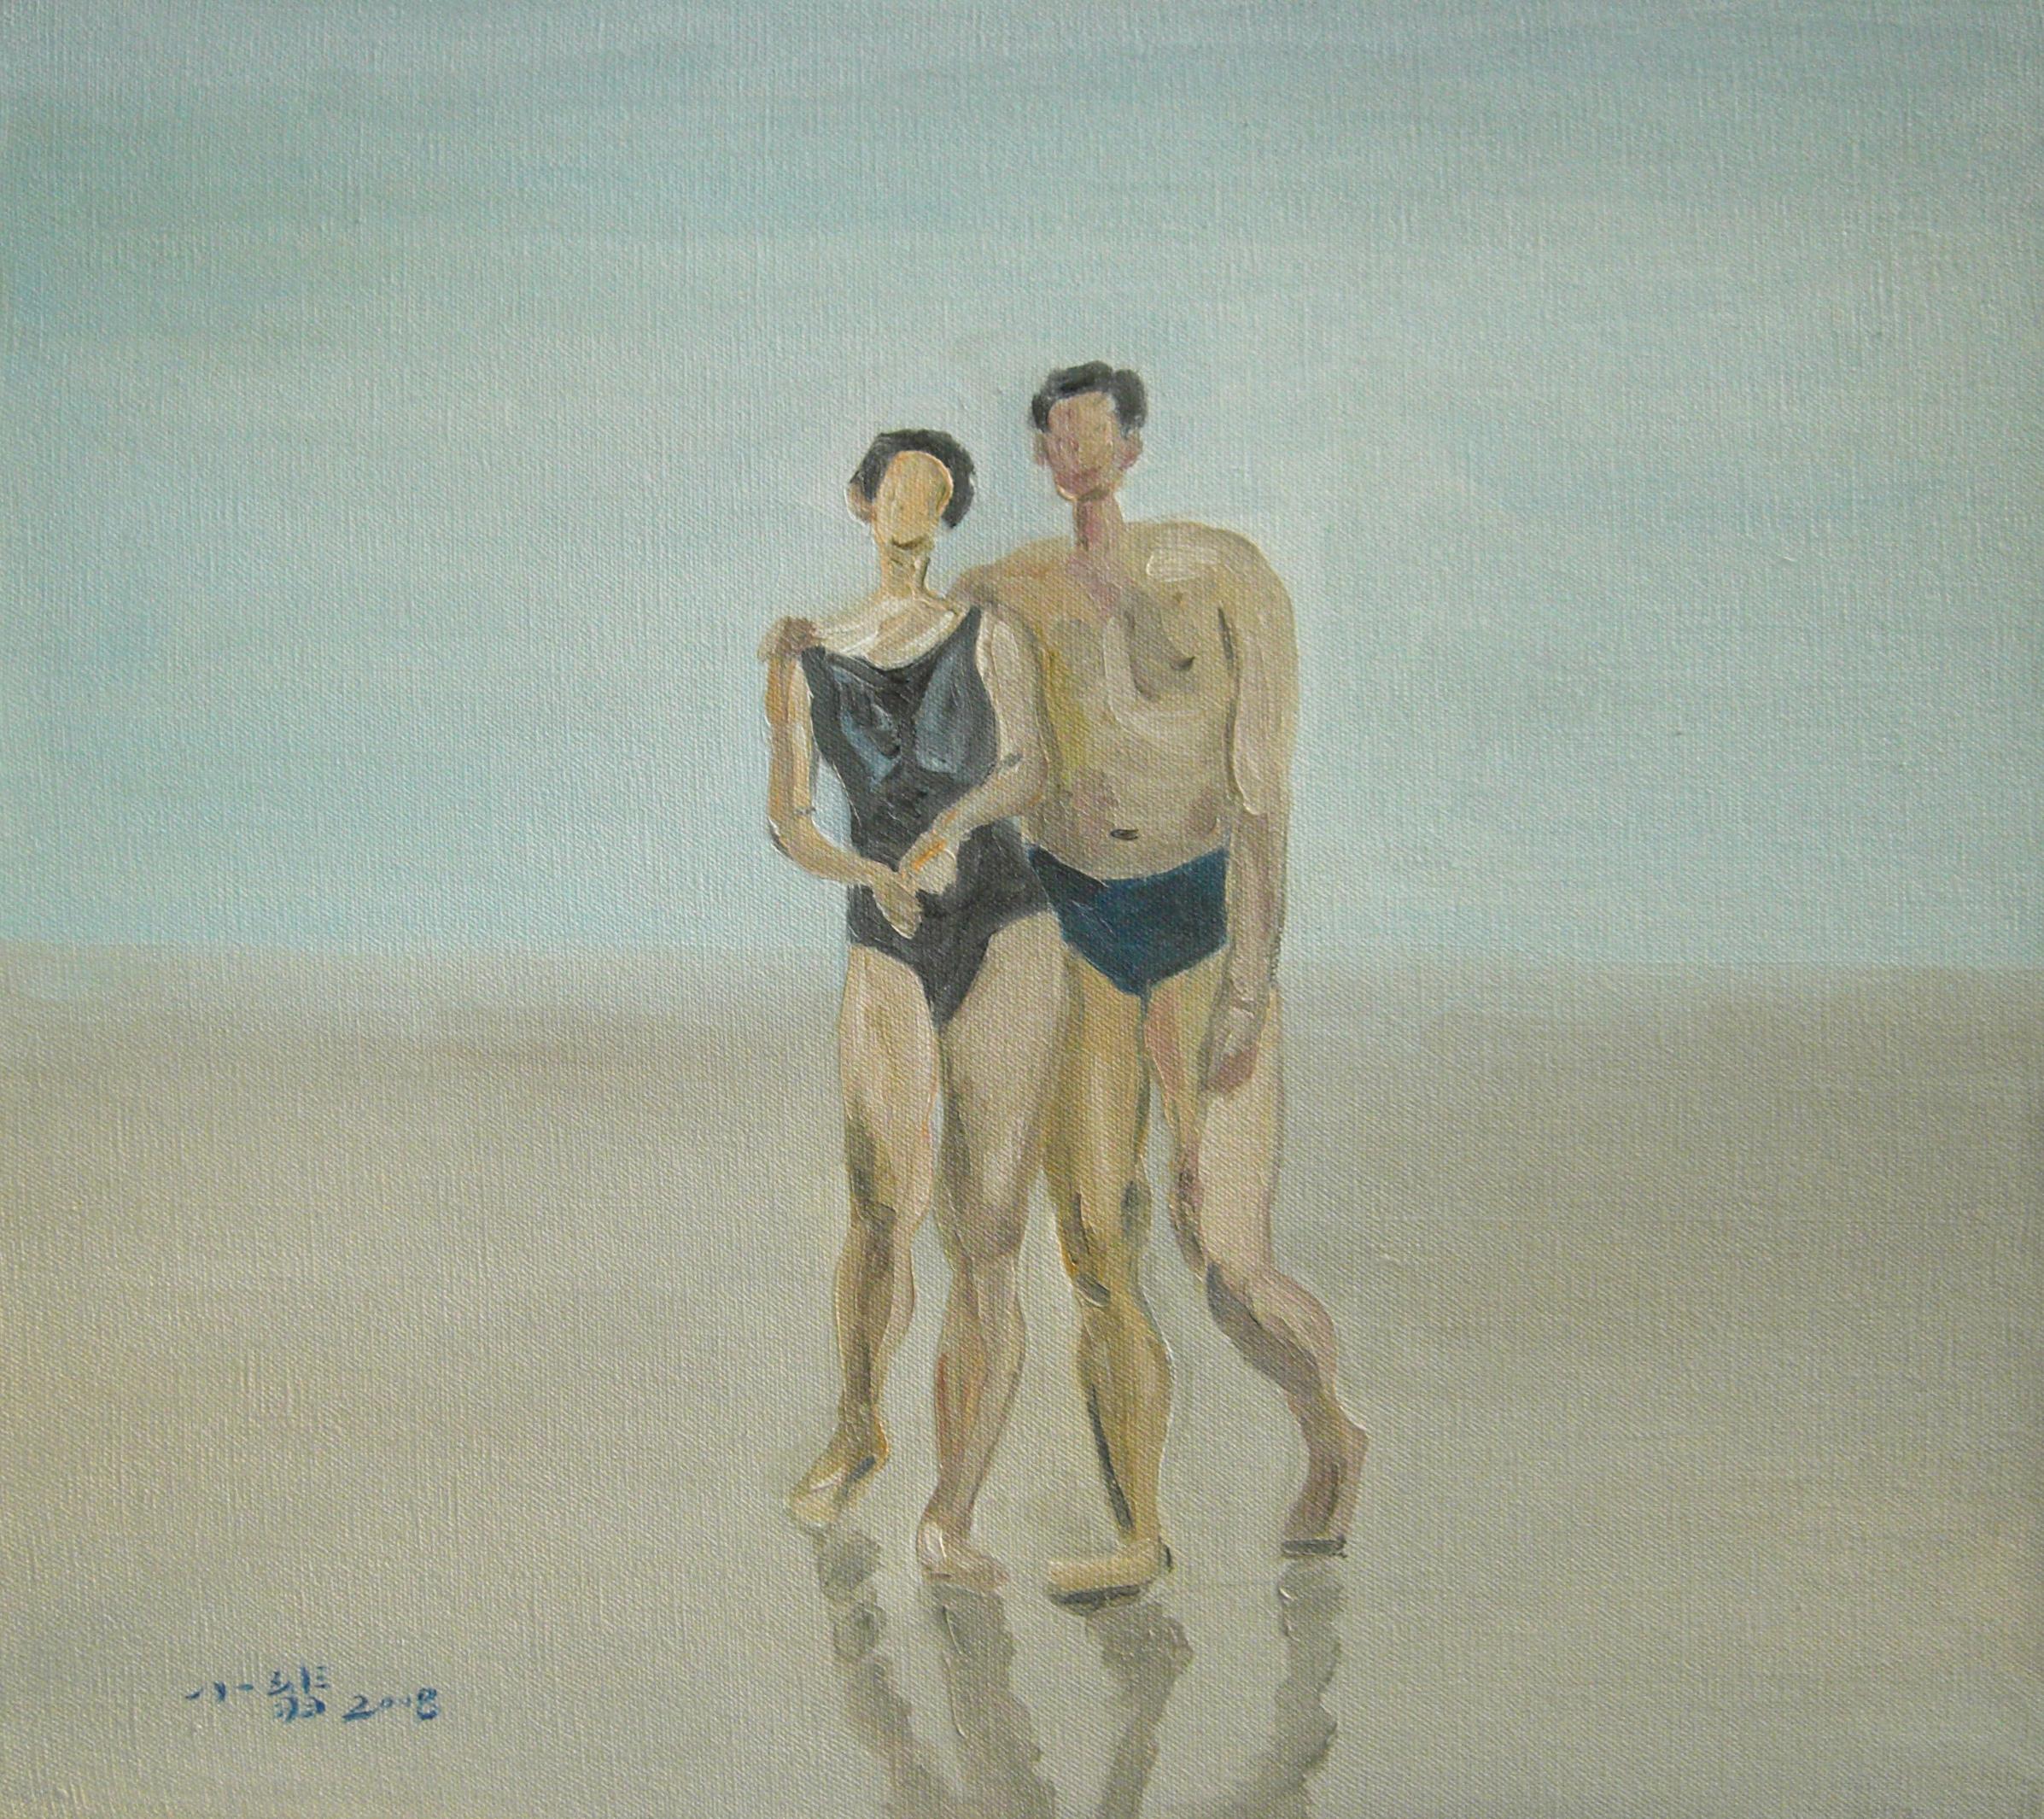 Gao,Xiaofei 蜜月 58x52 布面油画 2008.jpg $4,000.jpg